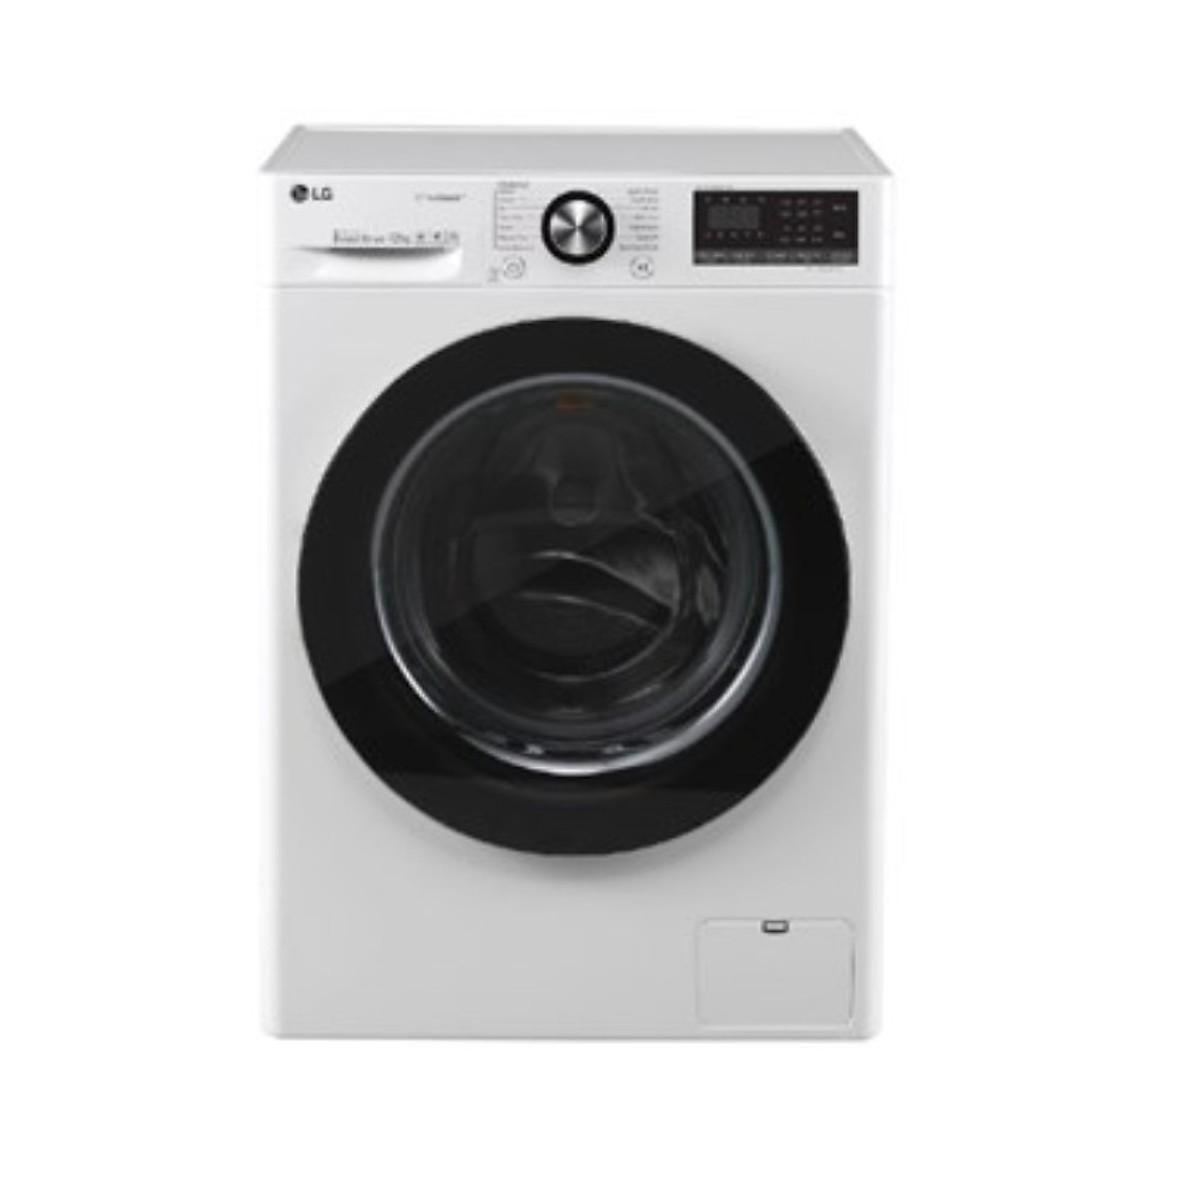 Máy giặt LG Inverter 10.5 kg FV1450S3V | Chaoban.com.vn